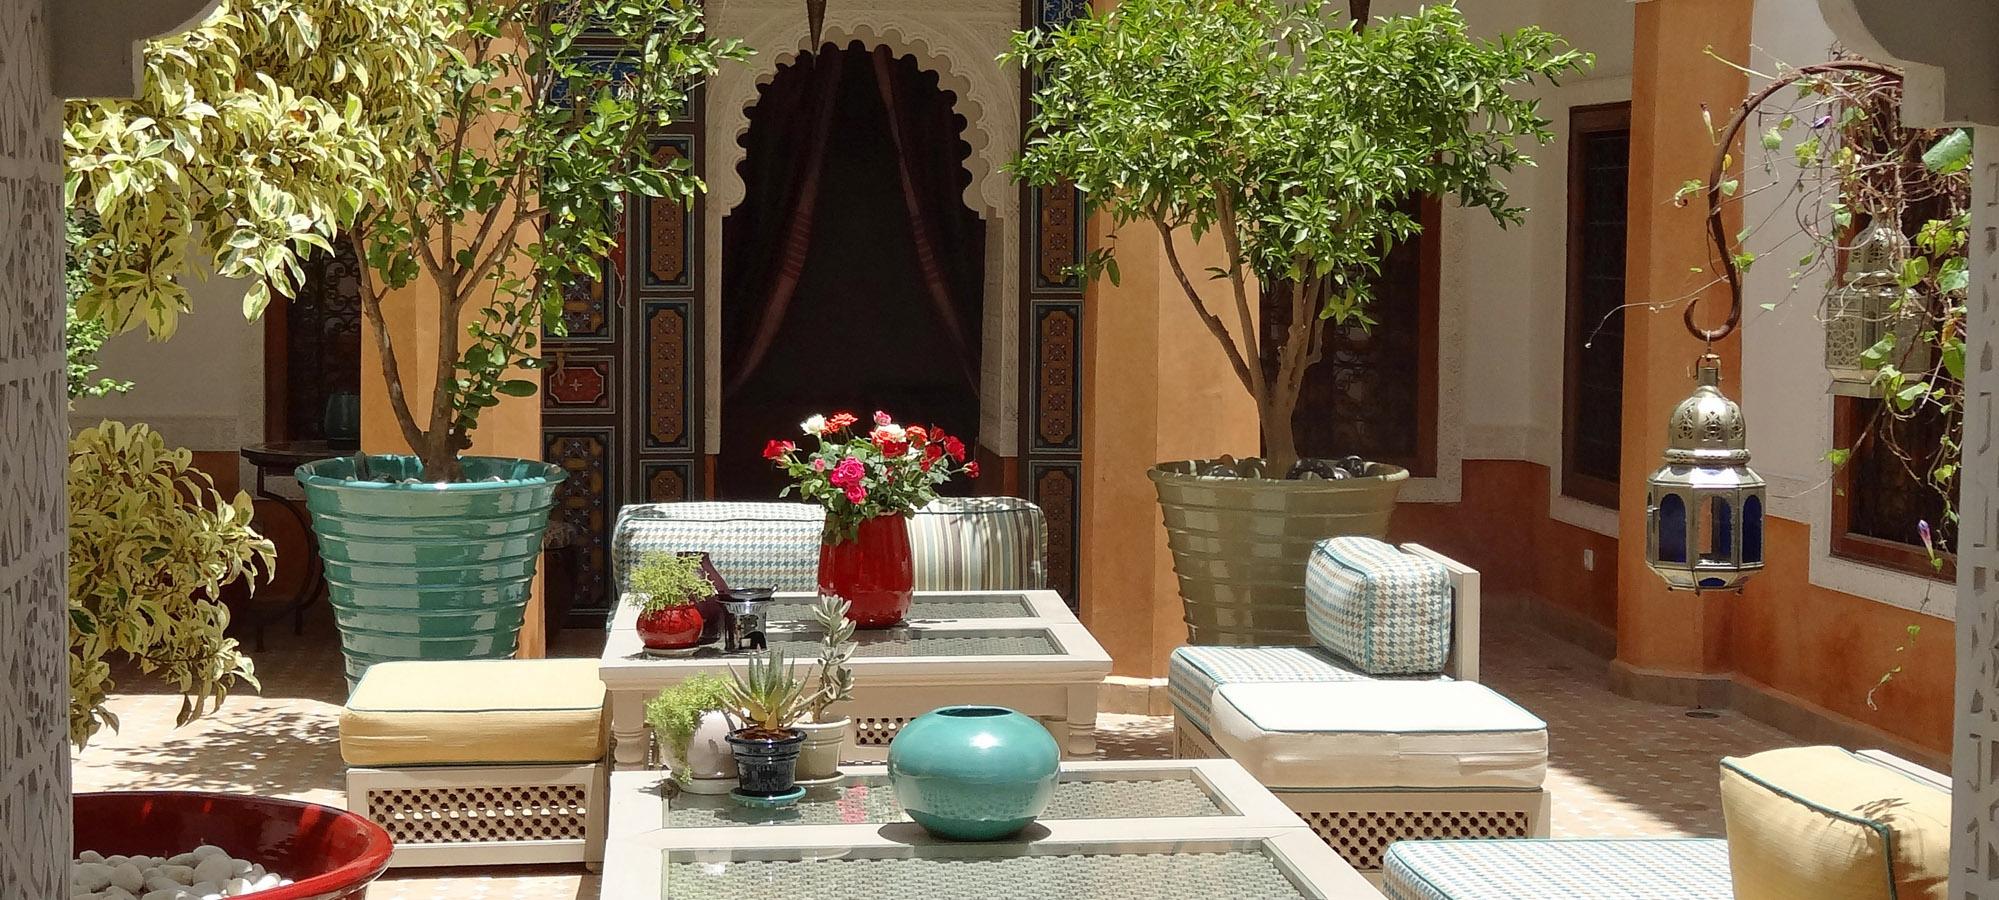 1. Home Courtyard